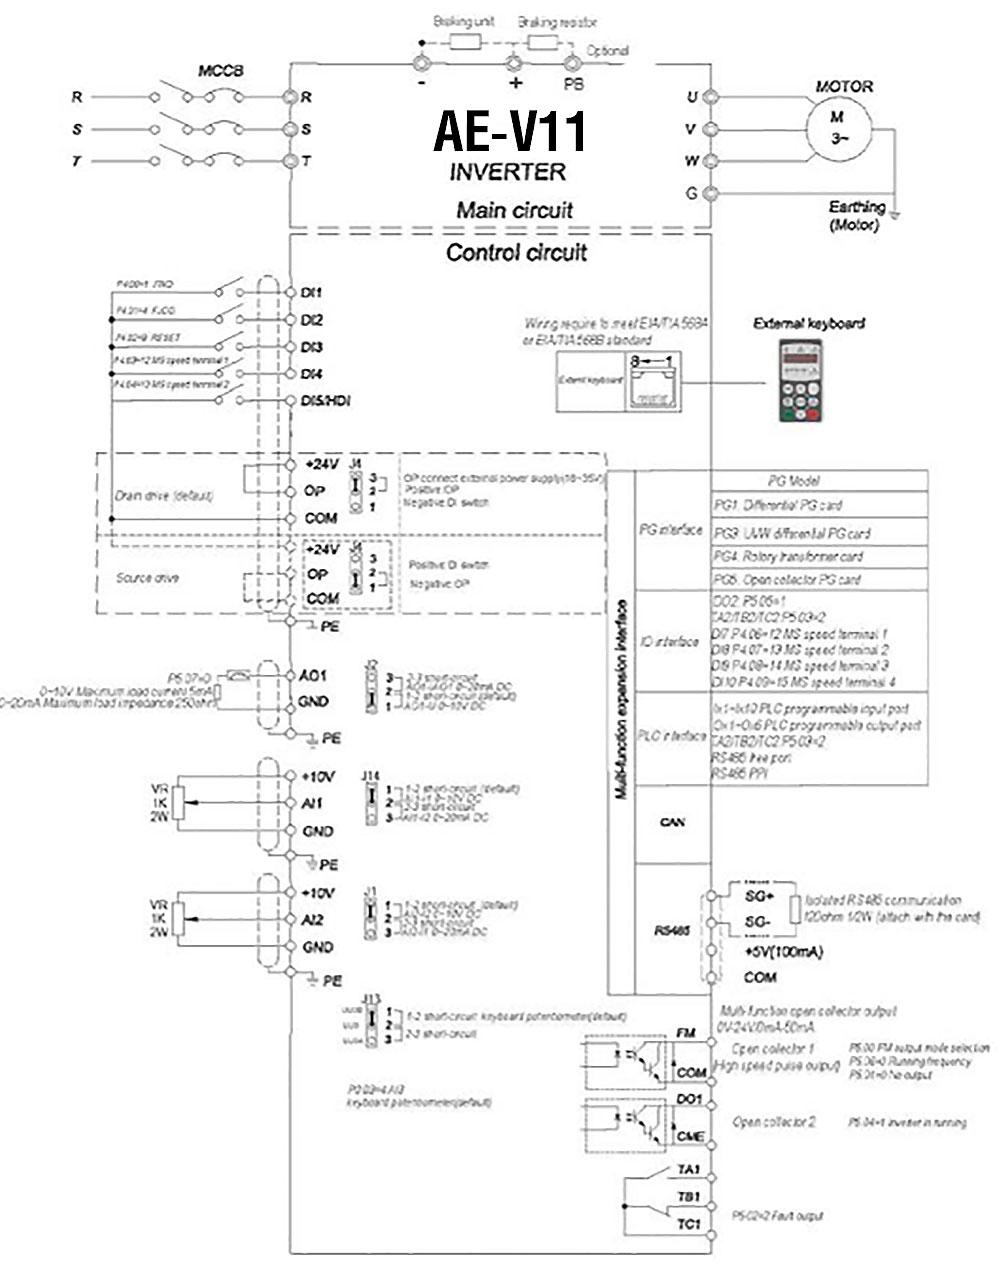 Wiring Diagram V11 Schematic Fisher Plow Http Wwwstorksautocom Indexphp 61515 Ae En Technology Rh Cn 1139 400